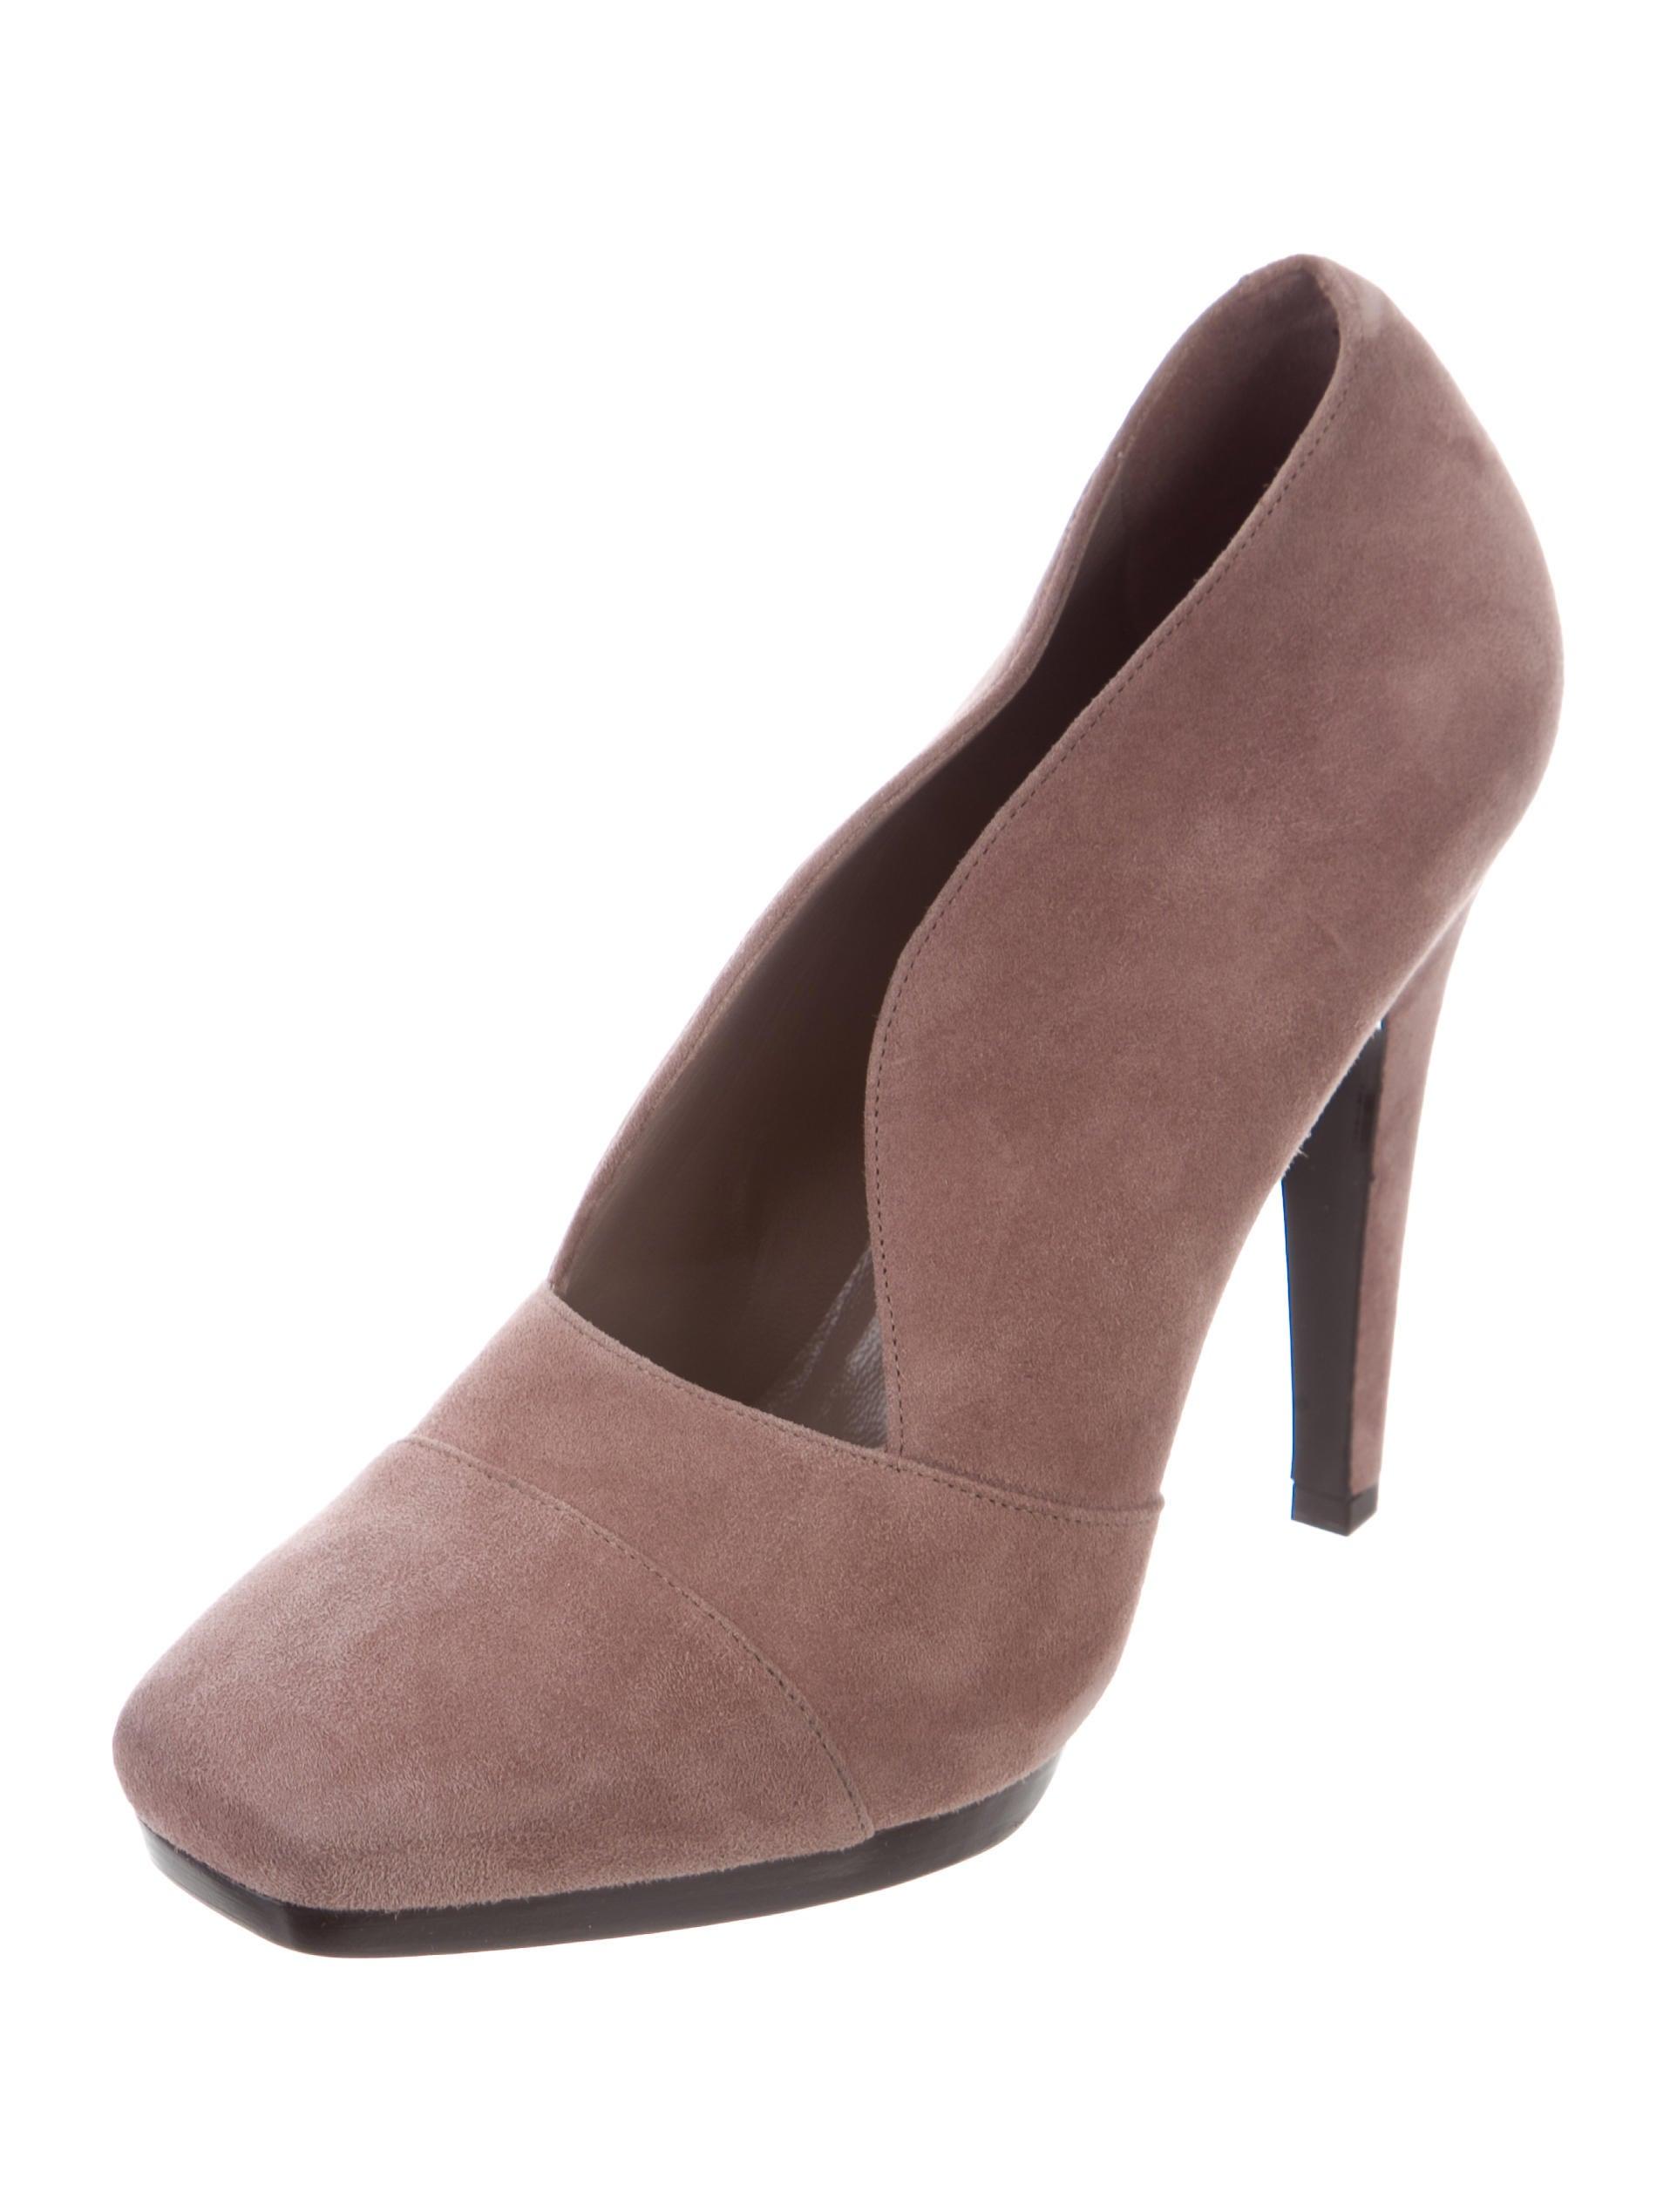 hermes women shoes - photo #25